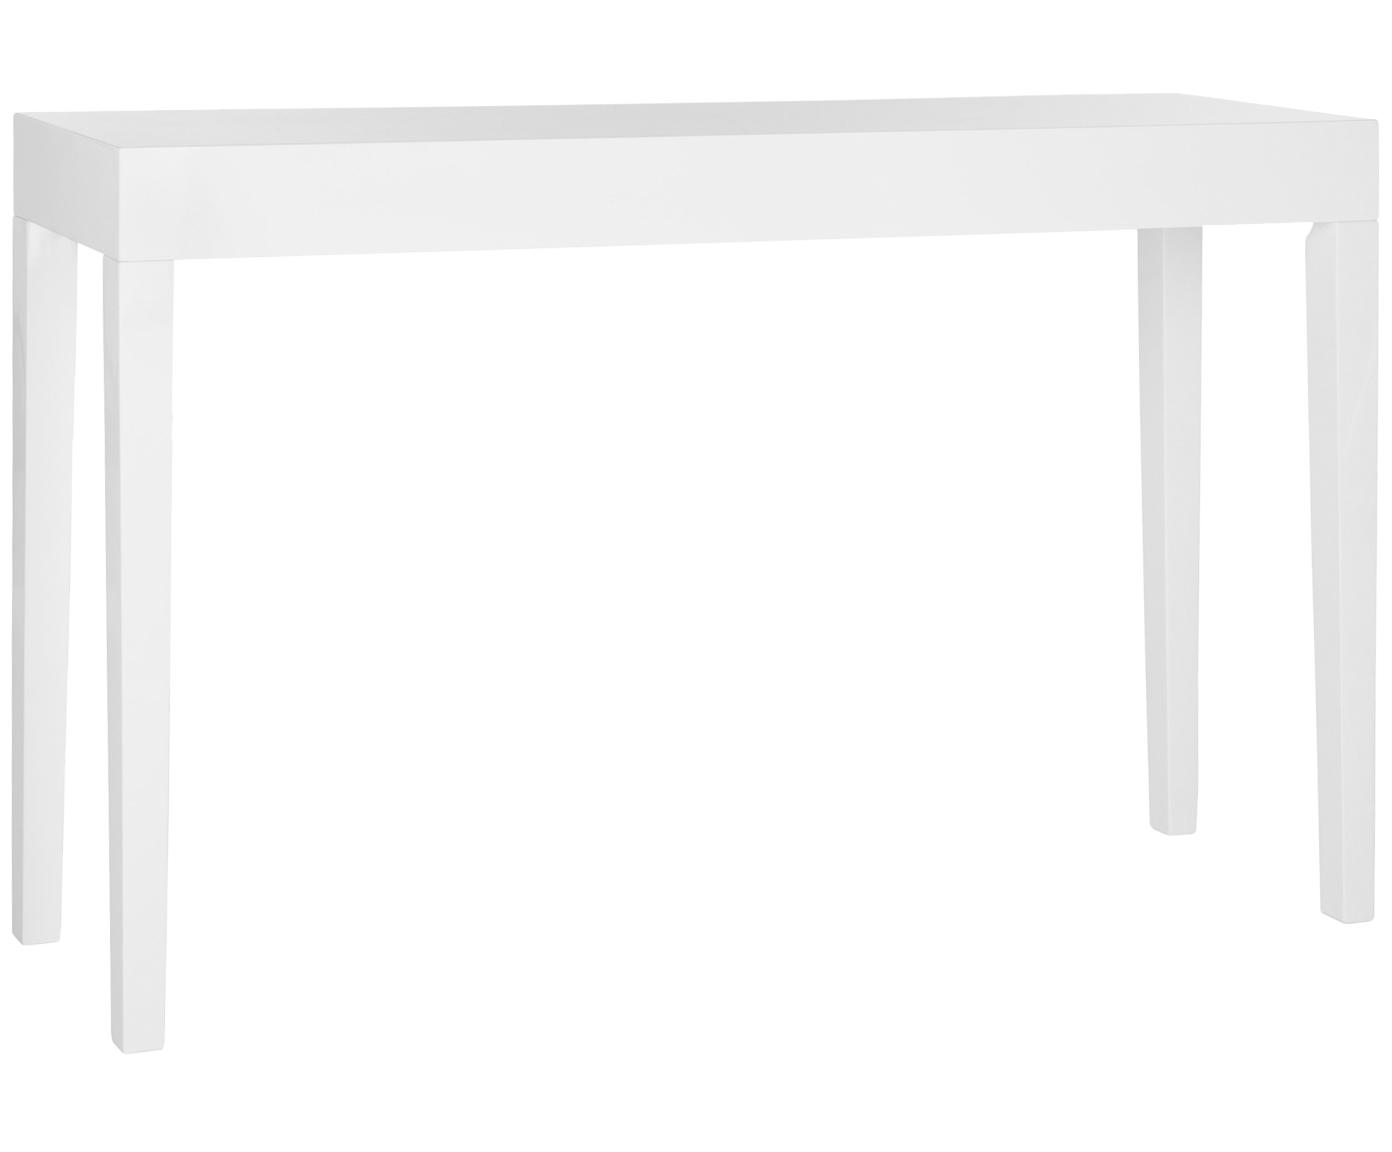 Consola artesanal Kayson, Tablero de fibras de densidad media(MDF), Blanco, An 130 x F 34 cm